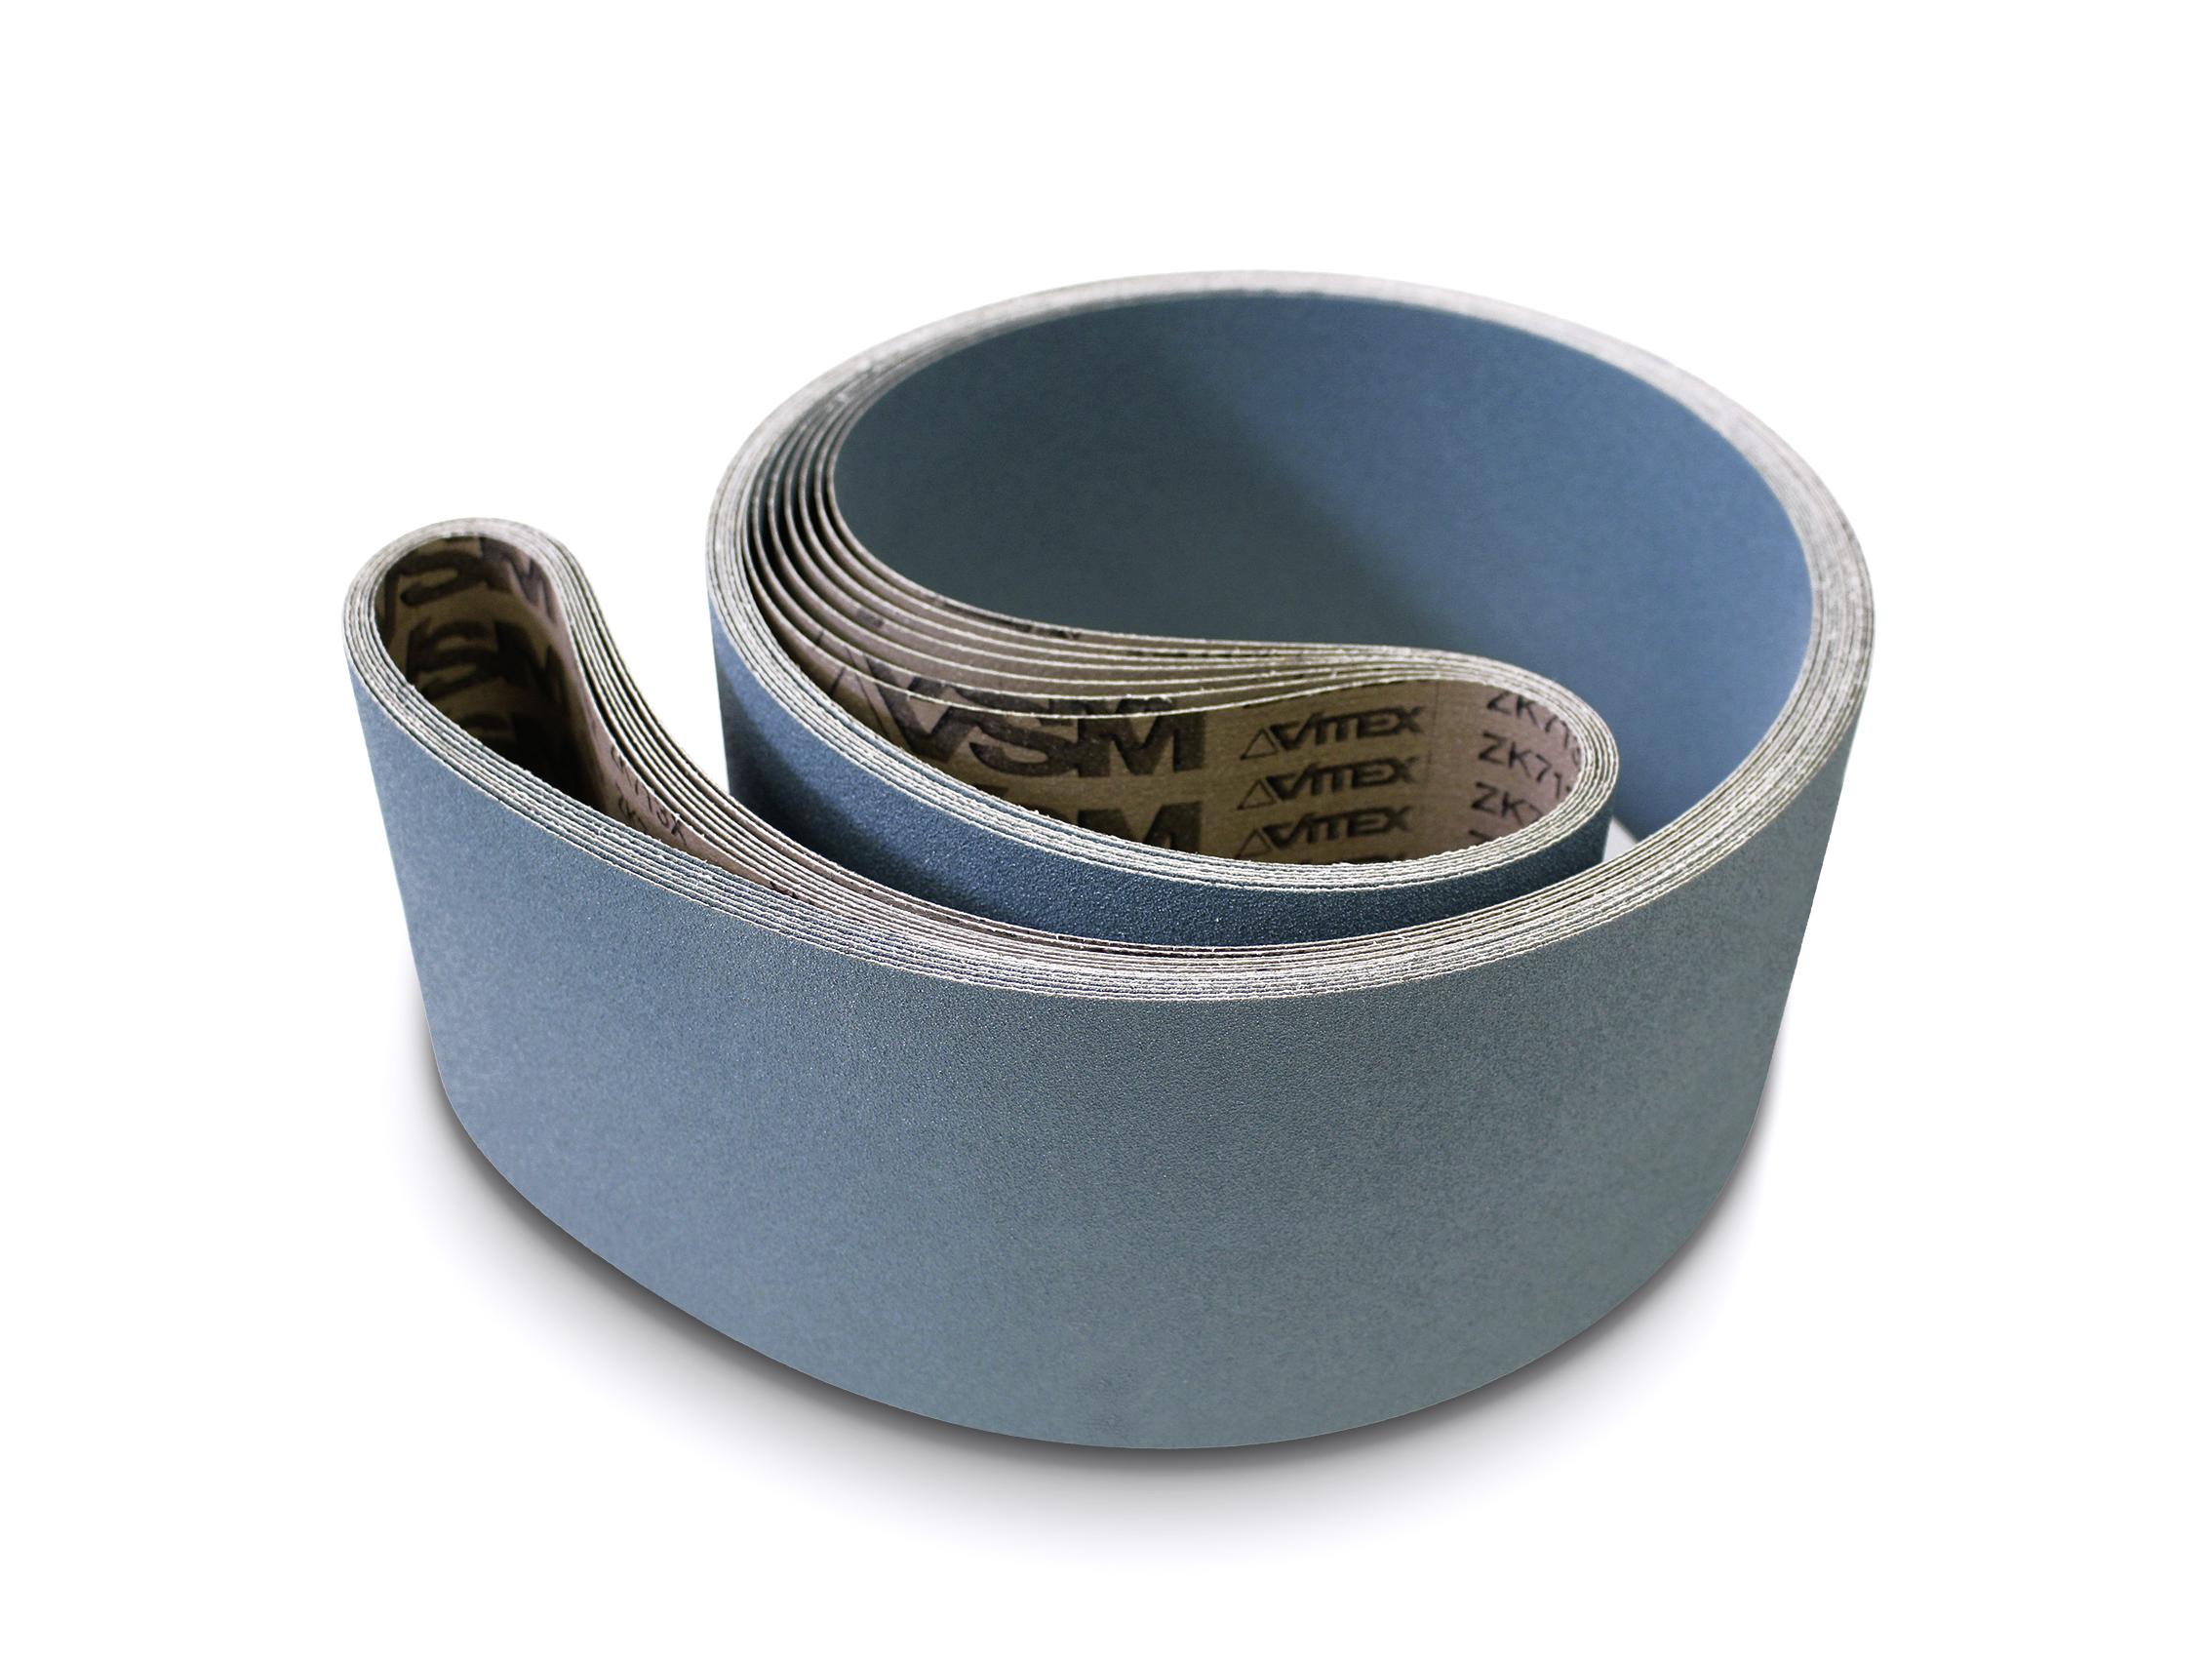 Korn 150 50x PFERD Policap Schleifkappen 10 mm Zylinderform